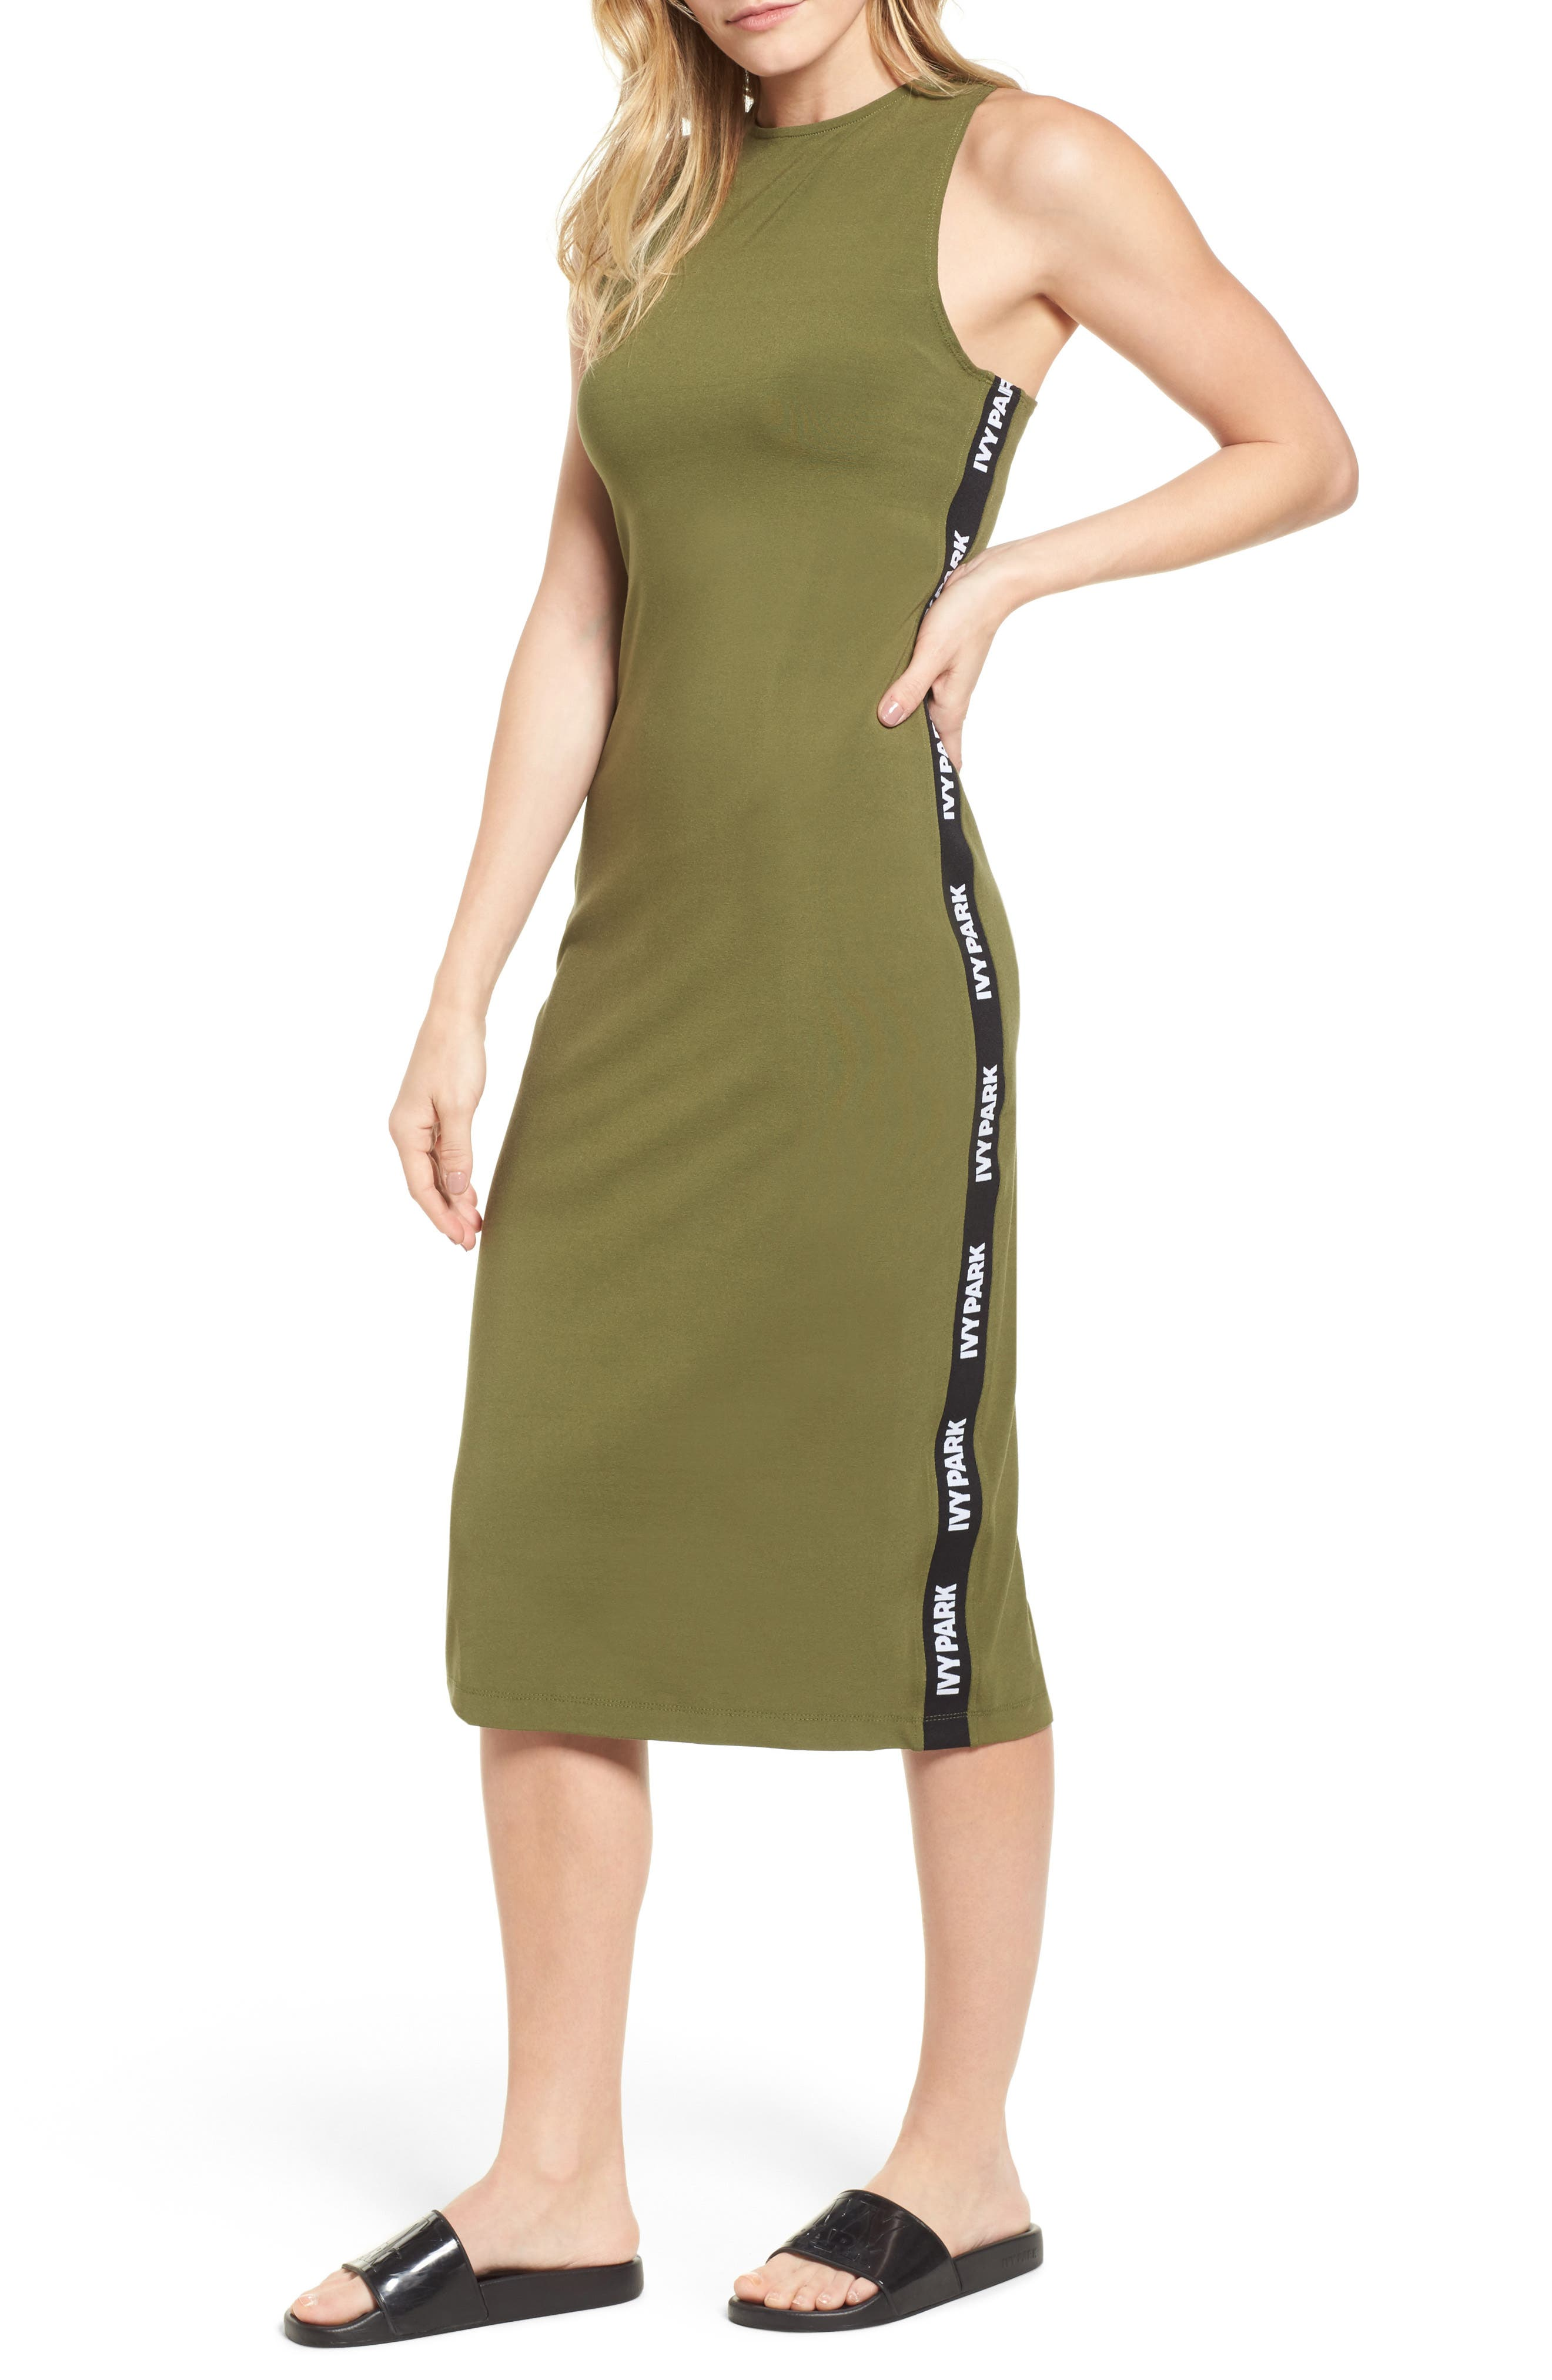 Alternate Image 1 Selected - IVY PARK® Logo Tape Dress